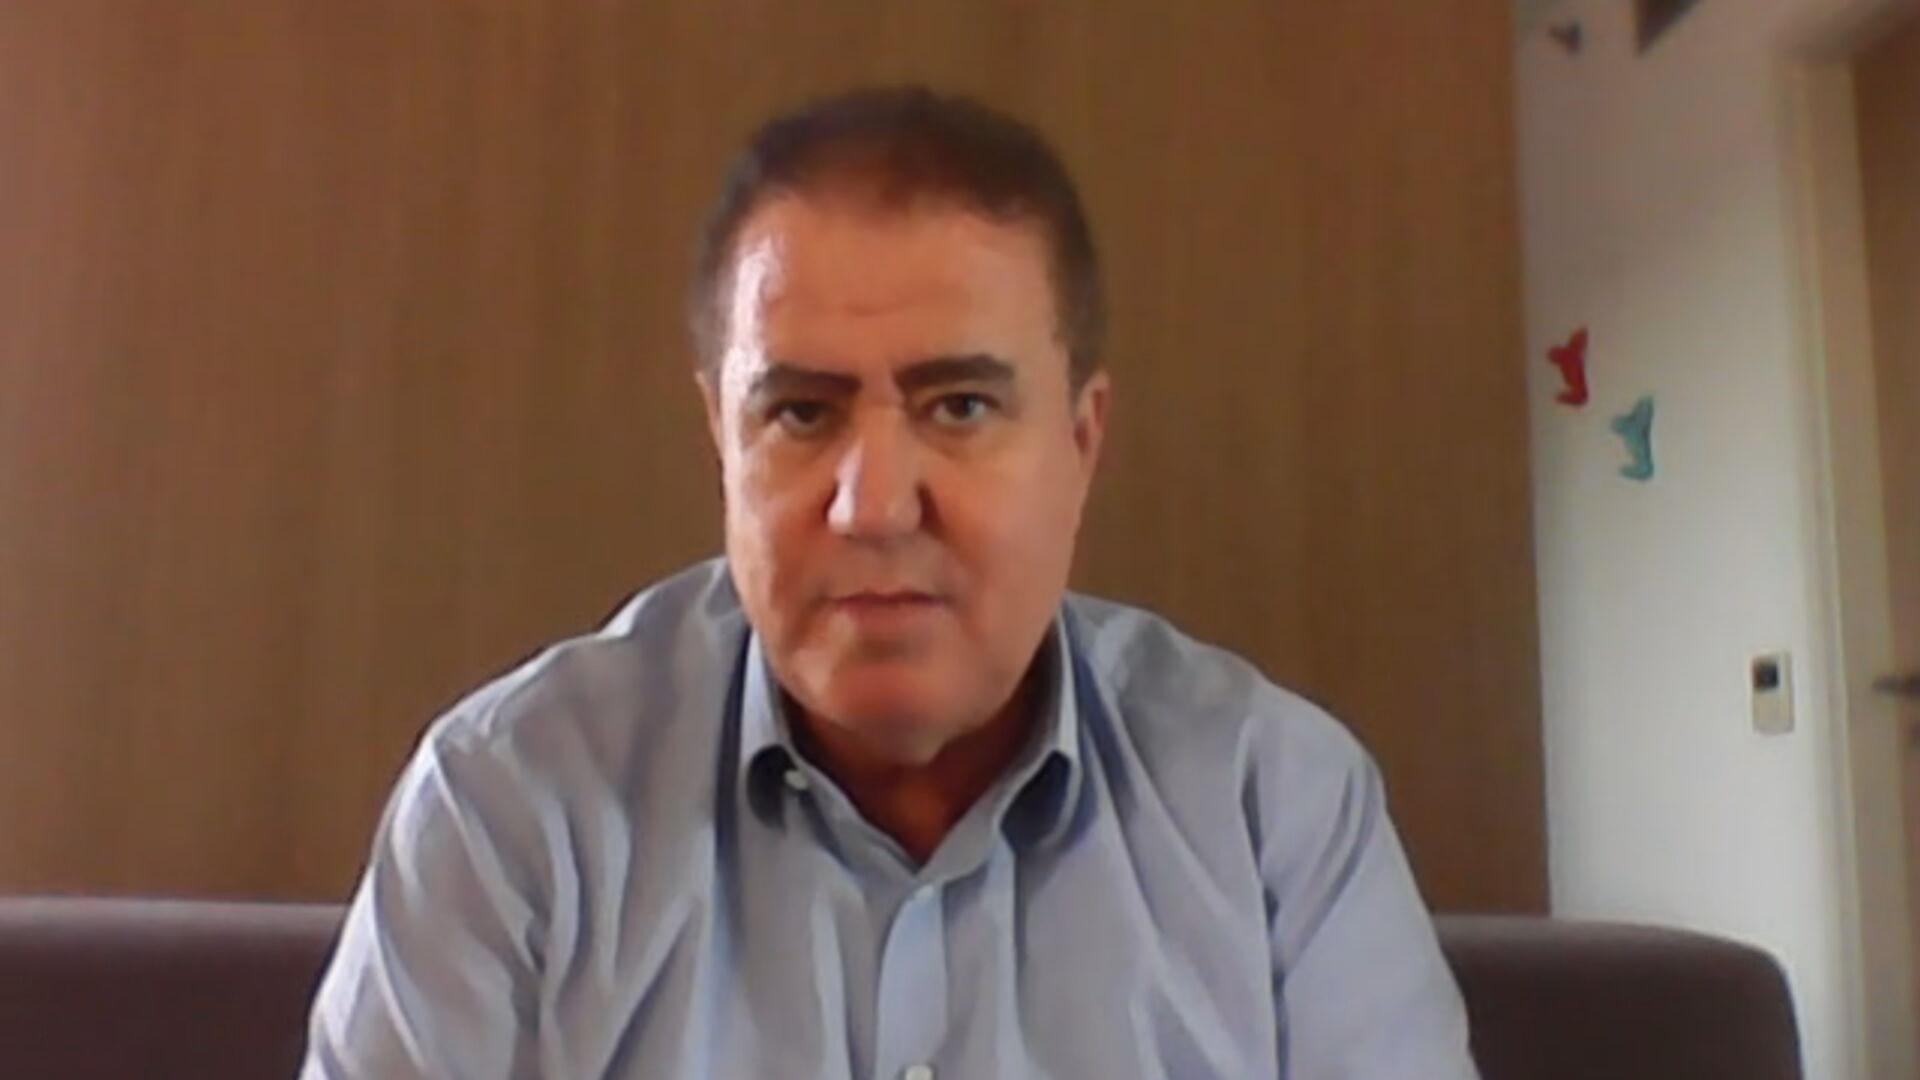 Presidente da Frente Nacional de Prefeitos, Jonas Donizette